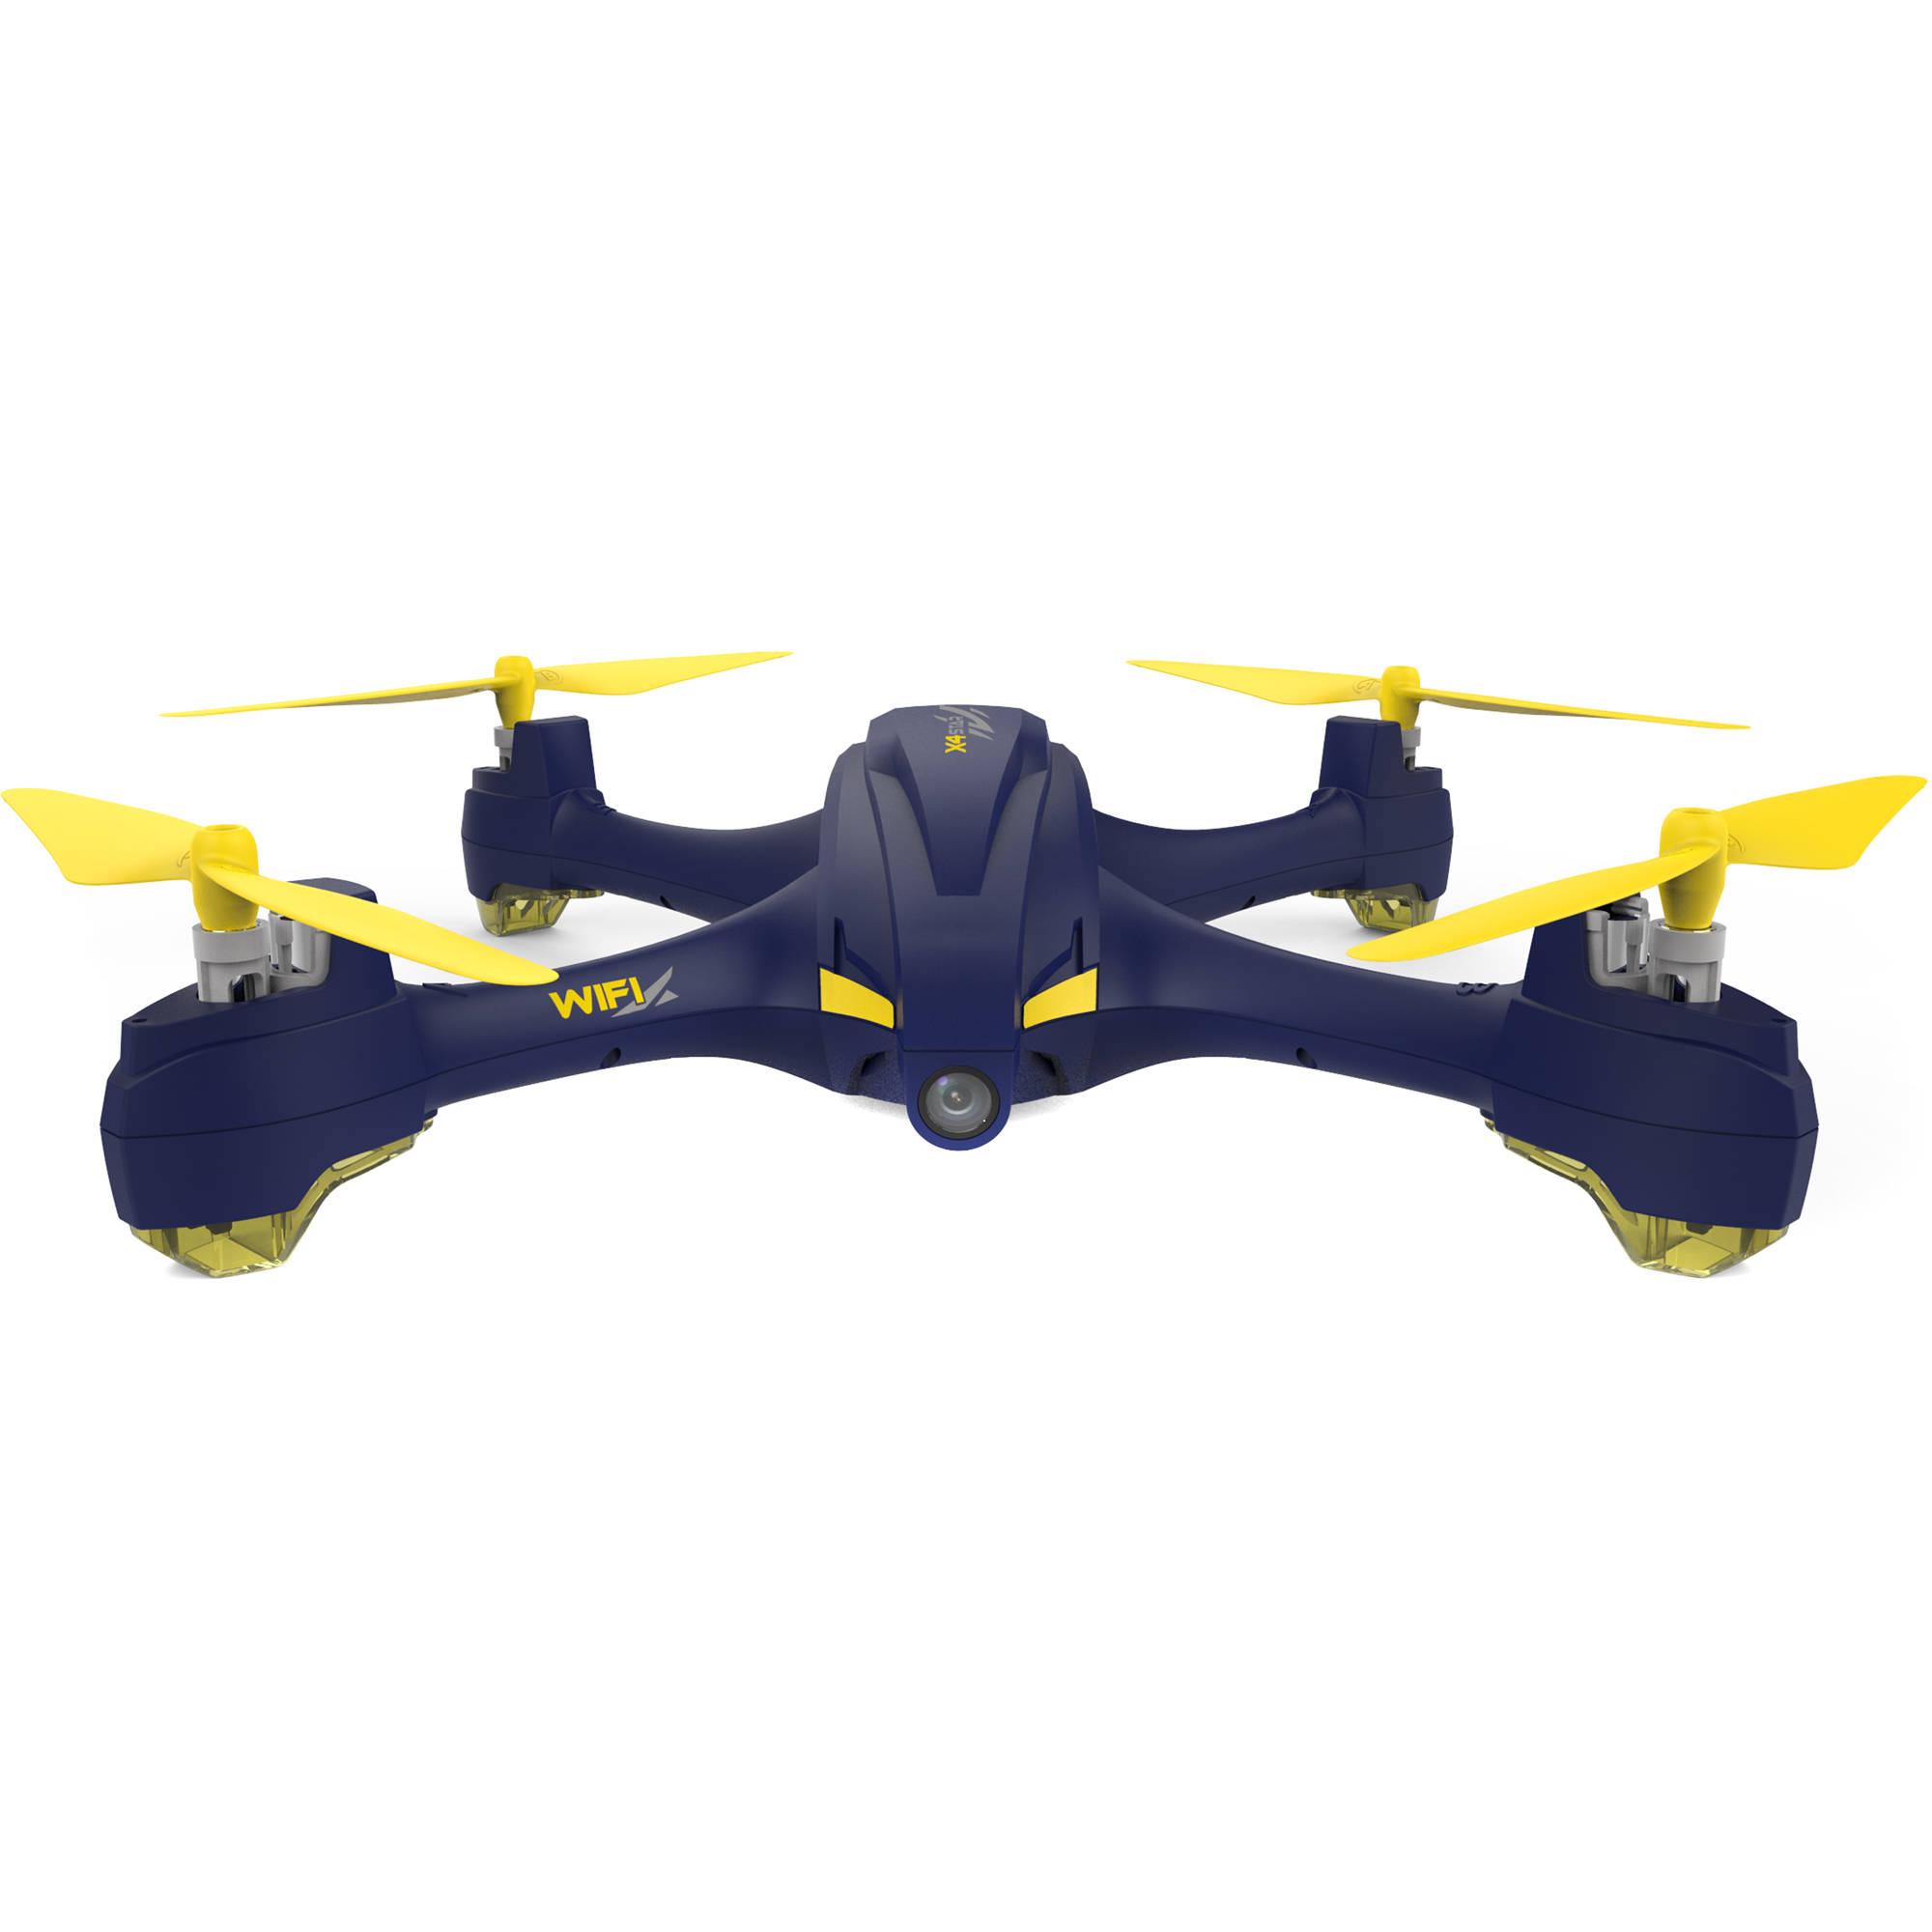 93b2ddbab99 HUBSAN X4 H507A Star Pro Quadcopter with 720p HD H507A (BL) B&H